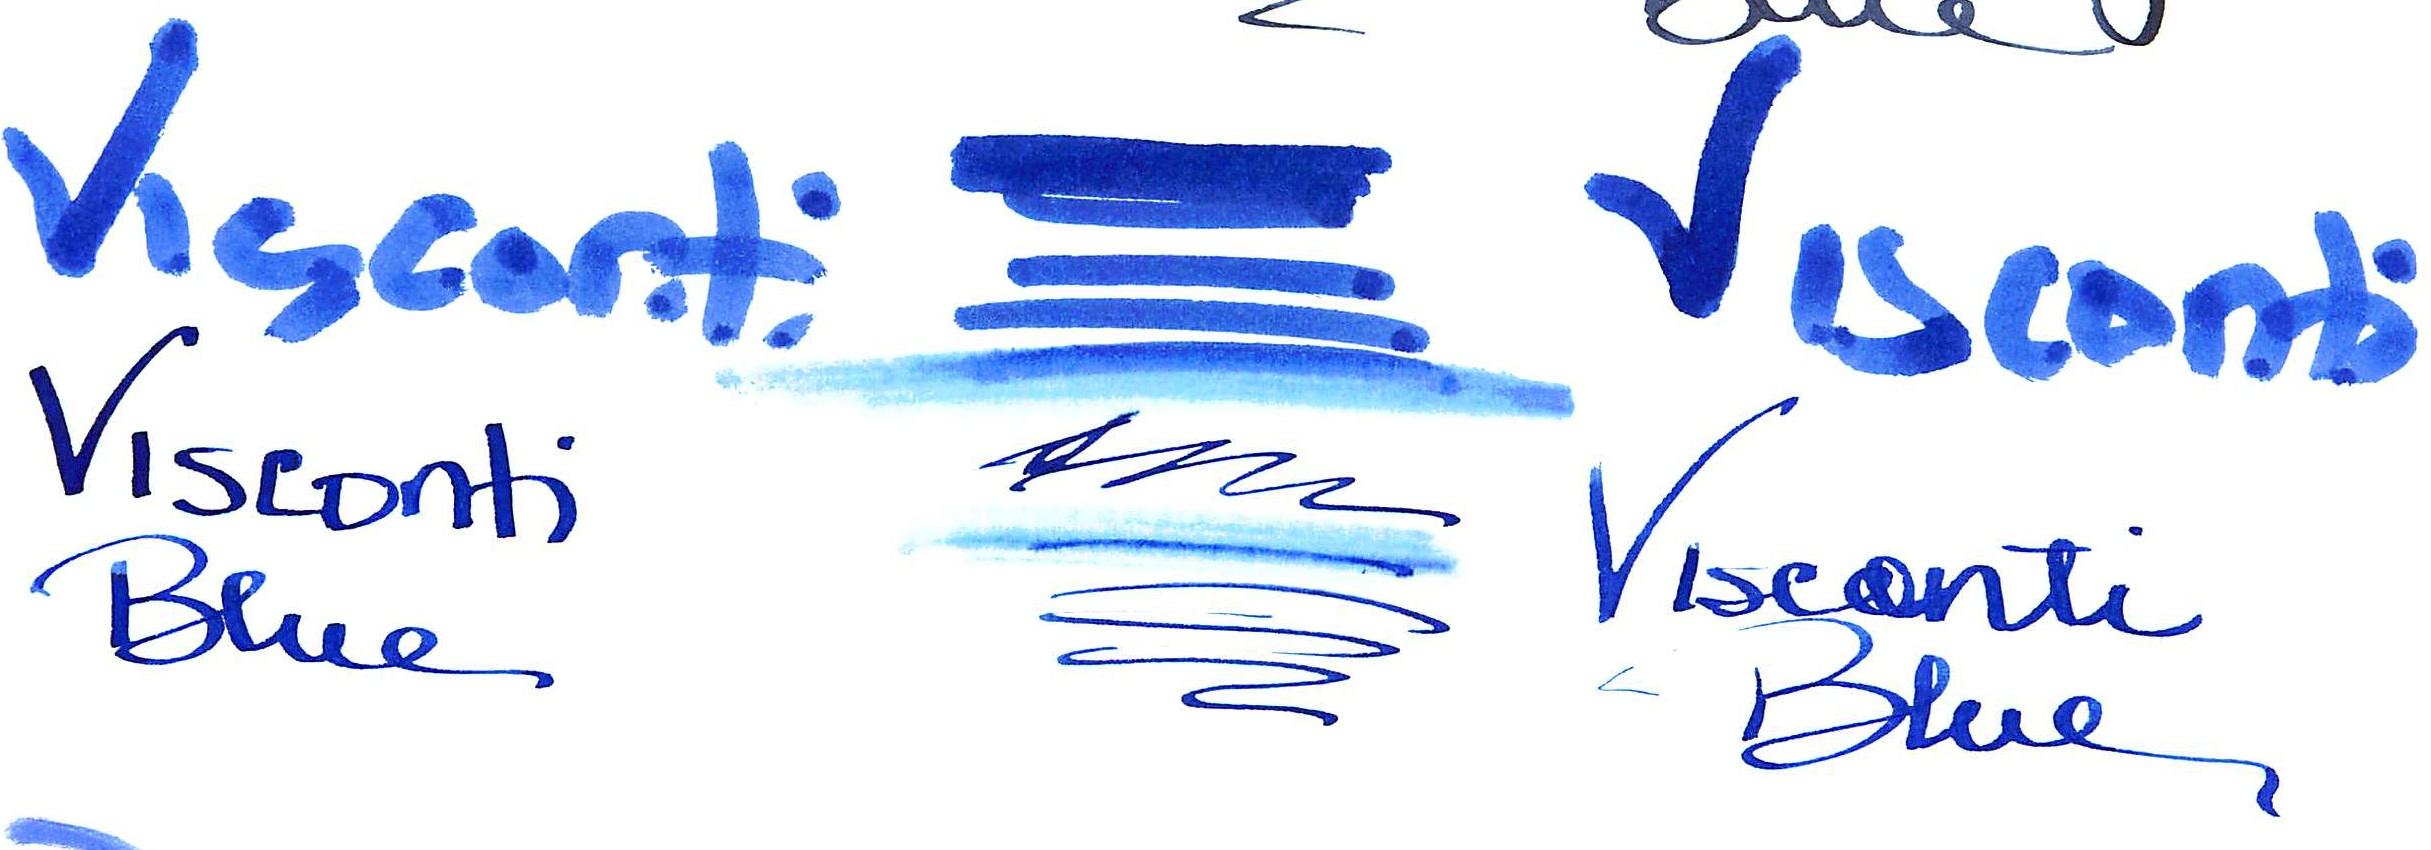 2012-02-25_01_Visconti.jpg